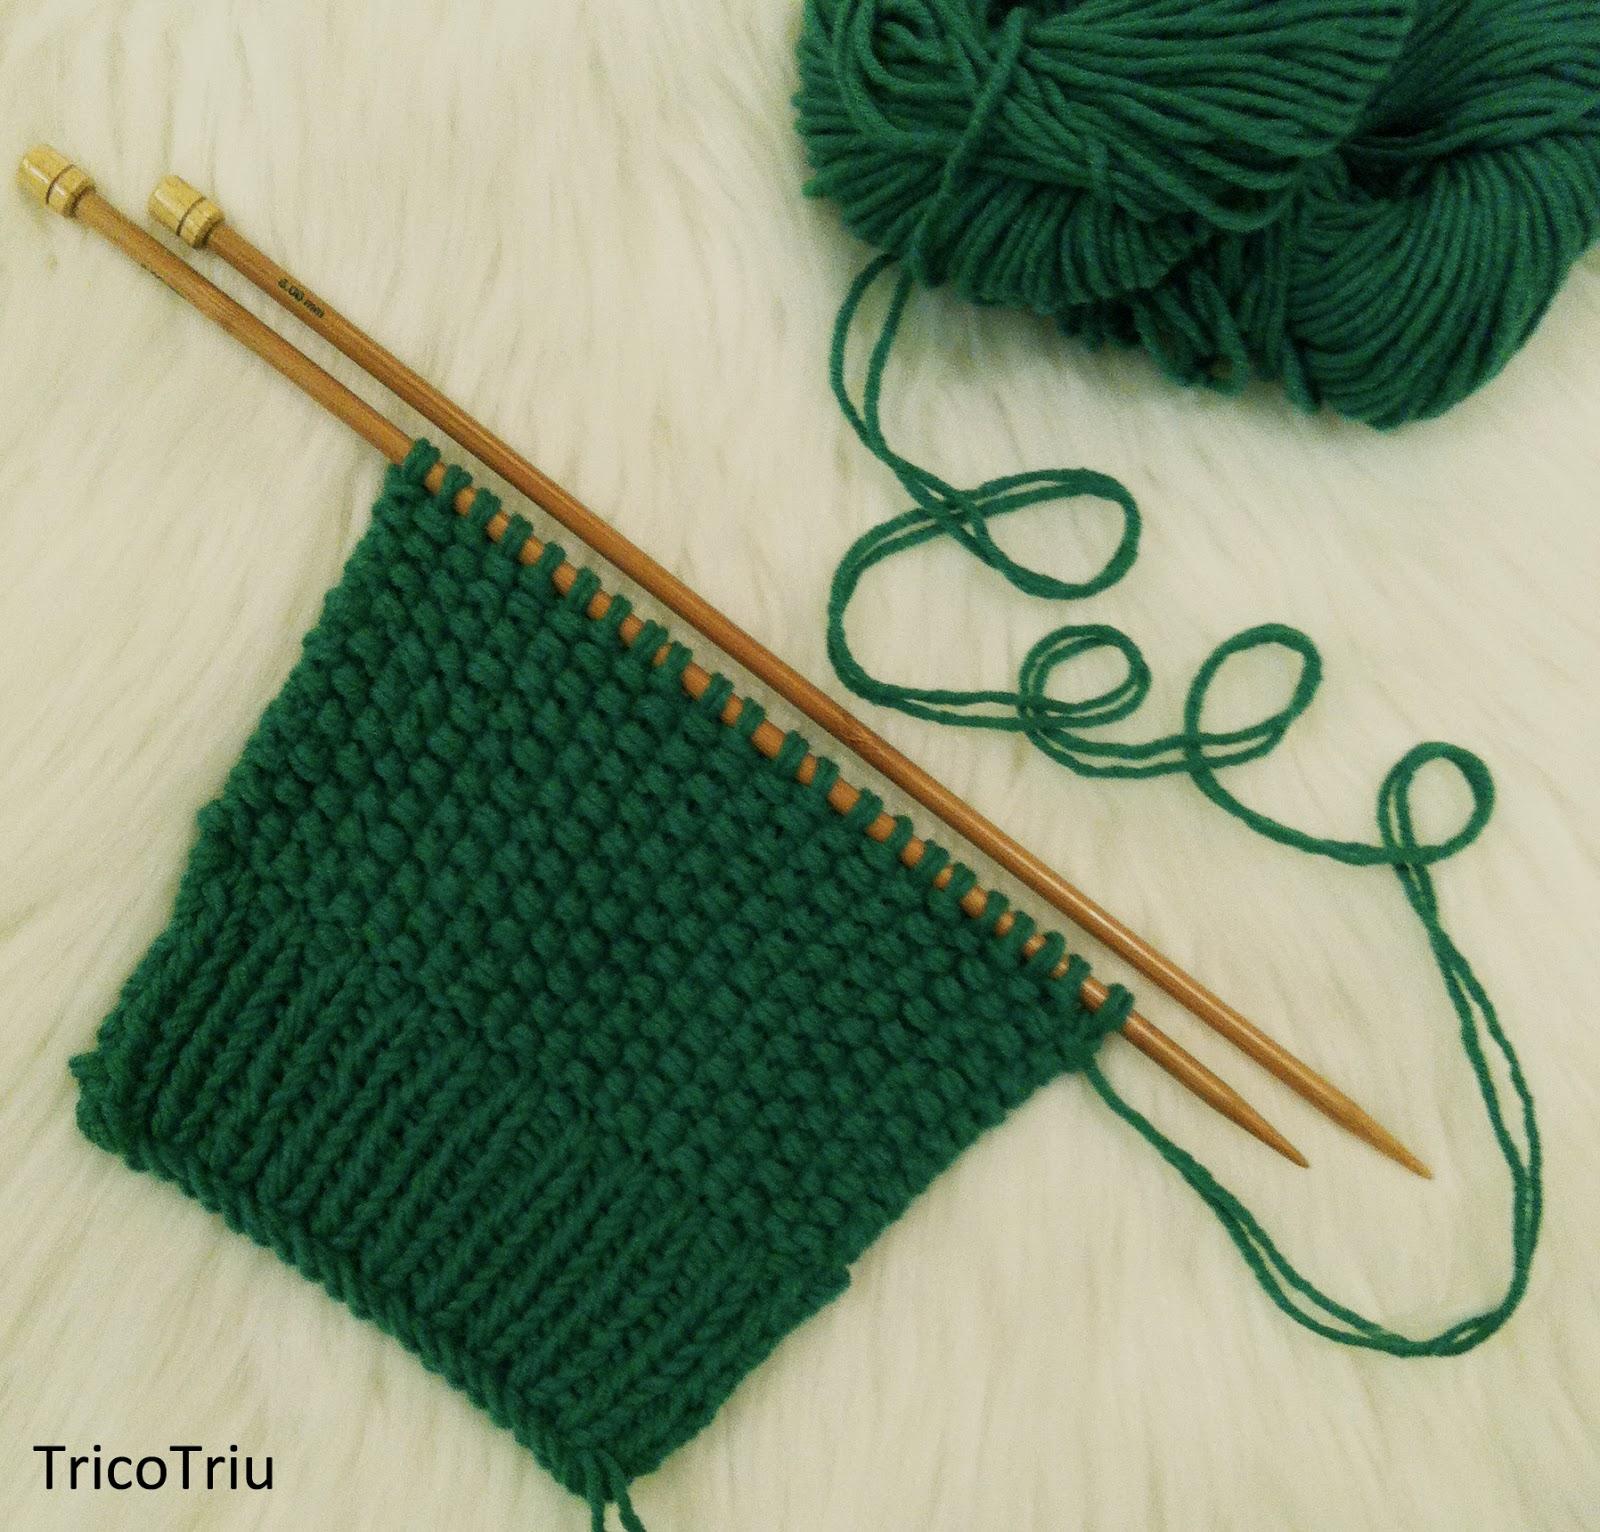 TricoTriu: Cashmere wool de Betta Knit - BK Mitones